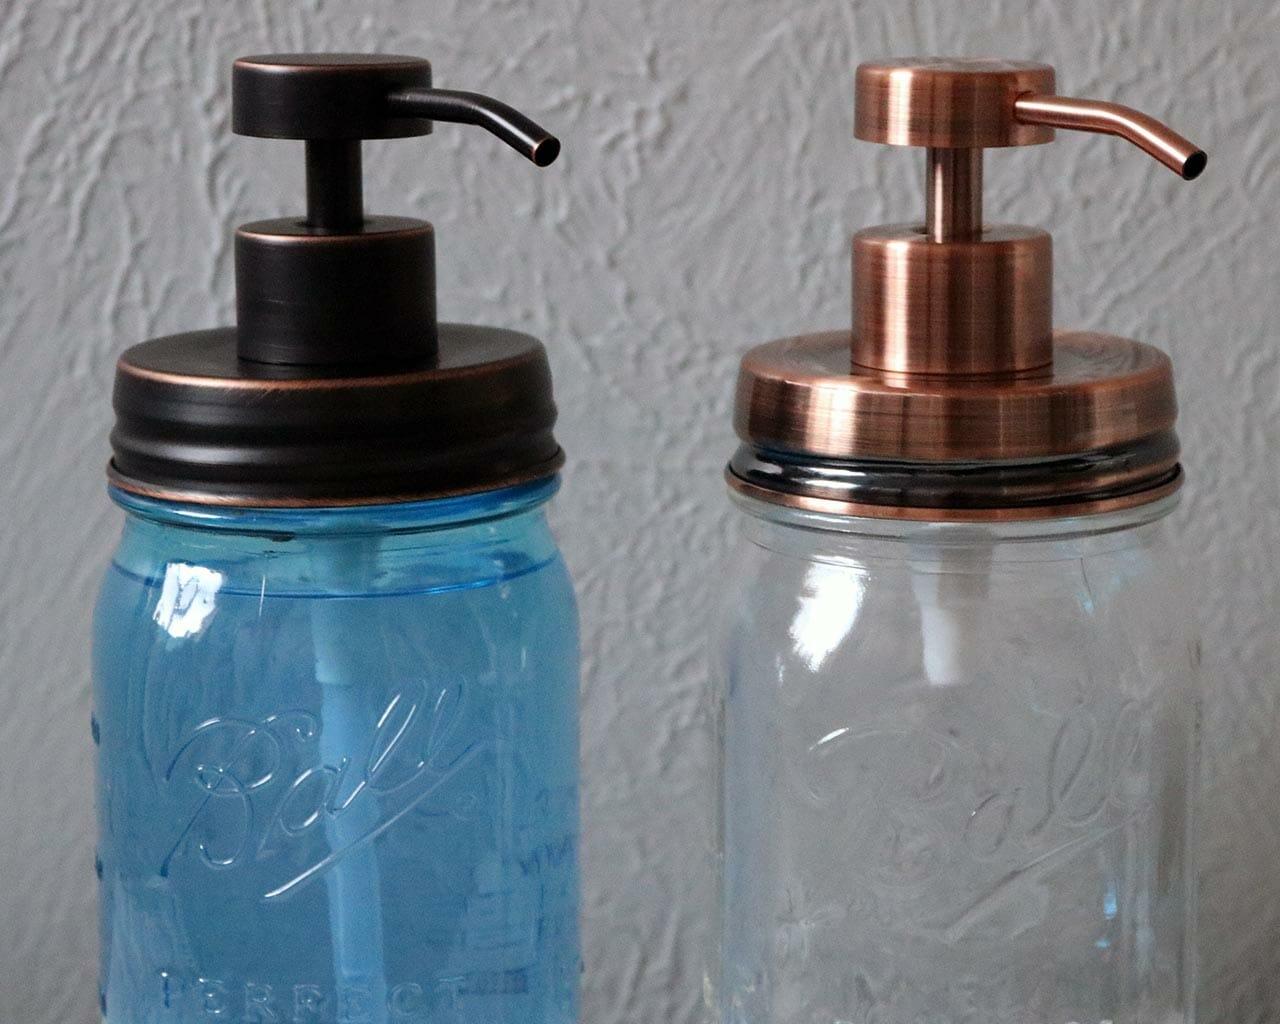 6edcd2cb19f Vintage copper and oil rubbed bronze soap pump dispenser lid kits on regular  mouth Ball Mason